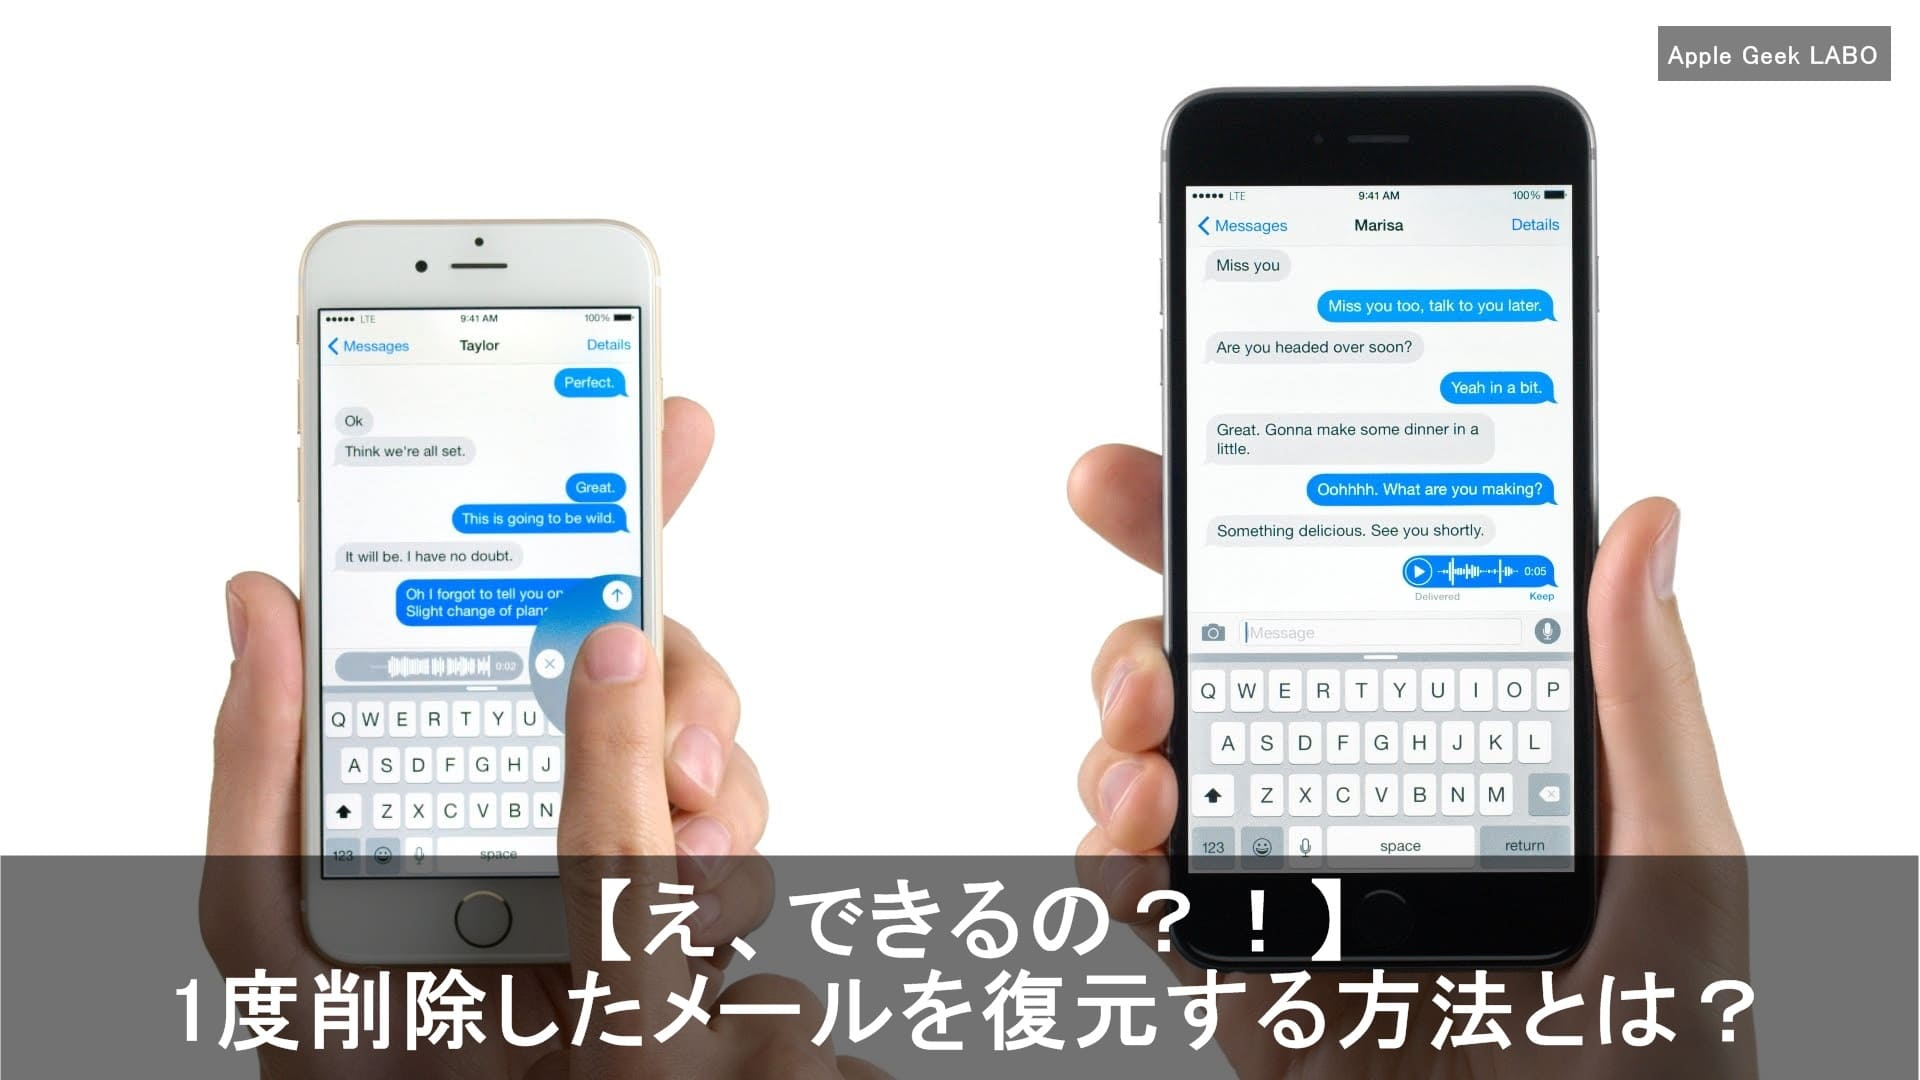 iphone mailhukugen